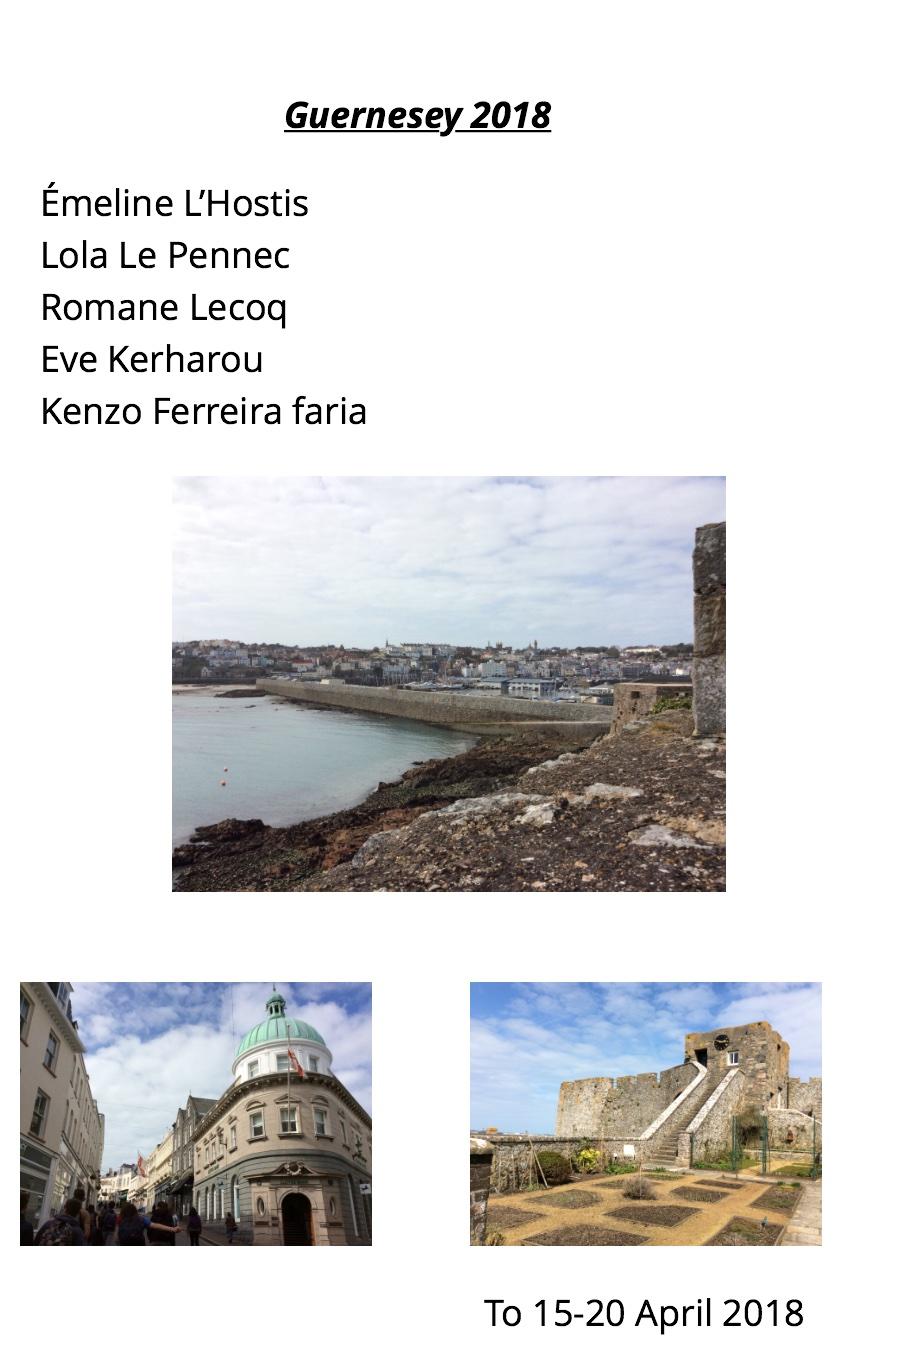 Guernsey 2018